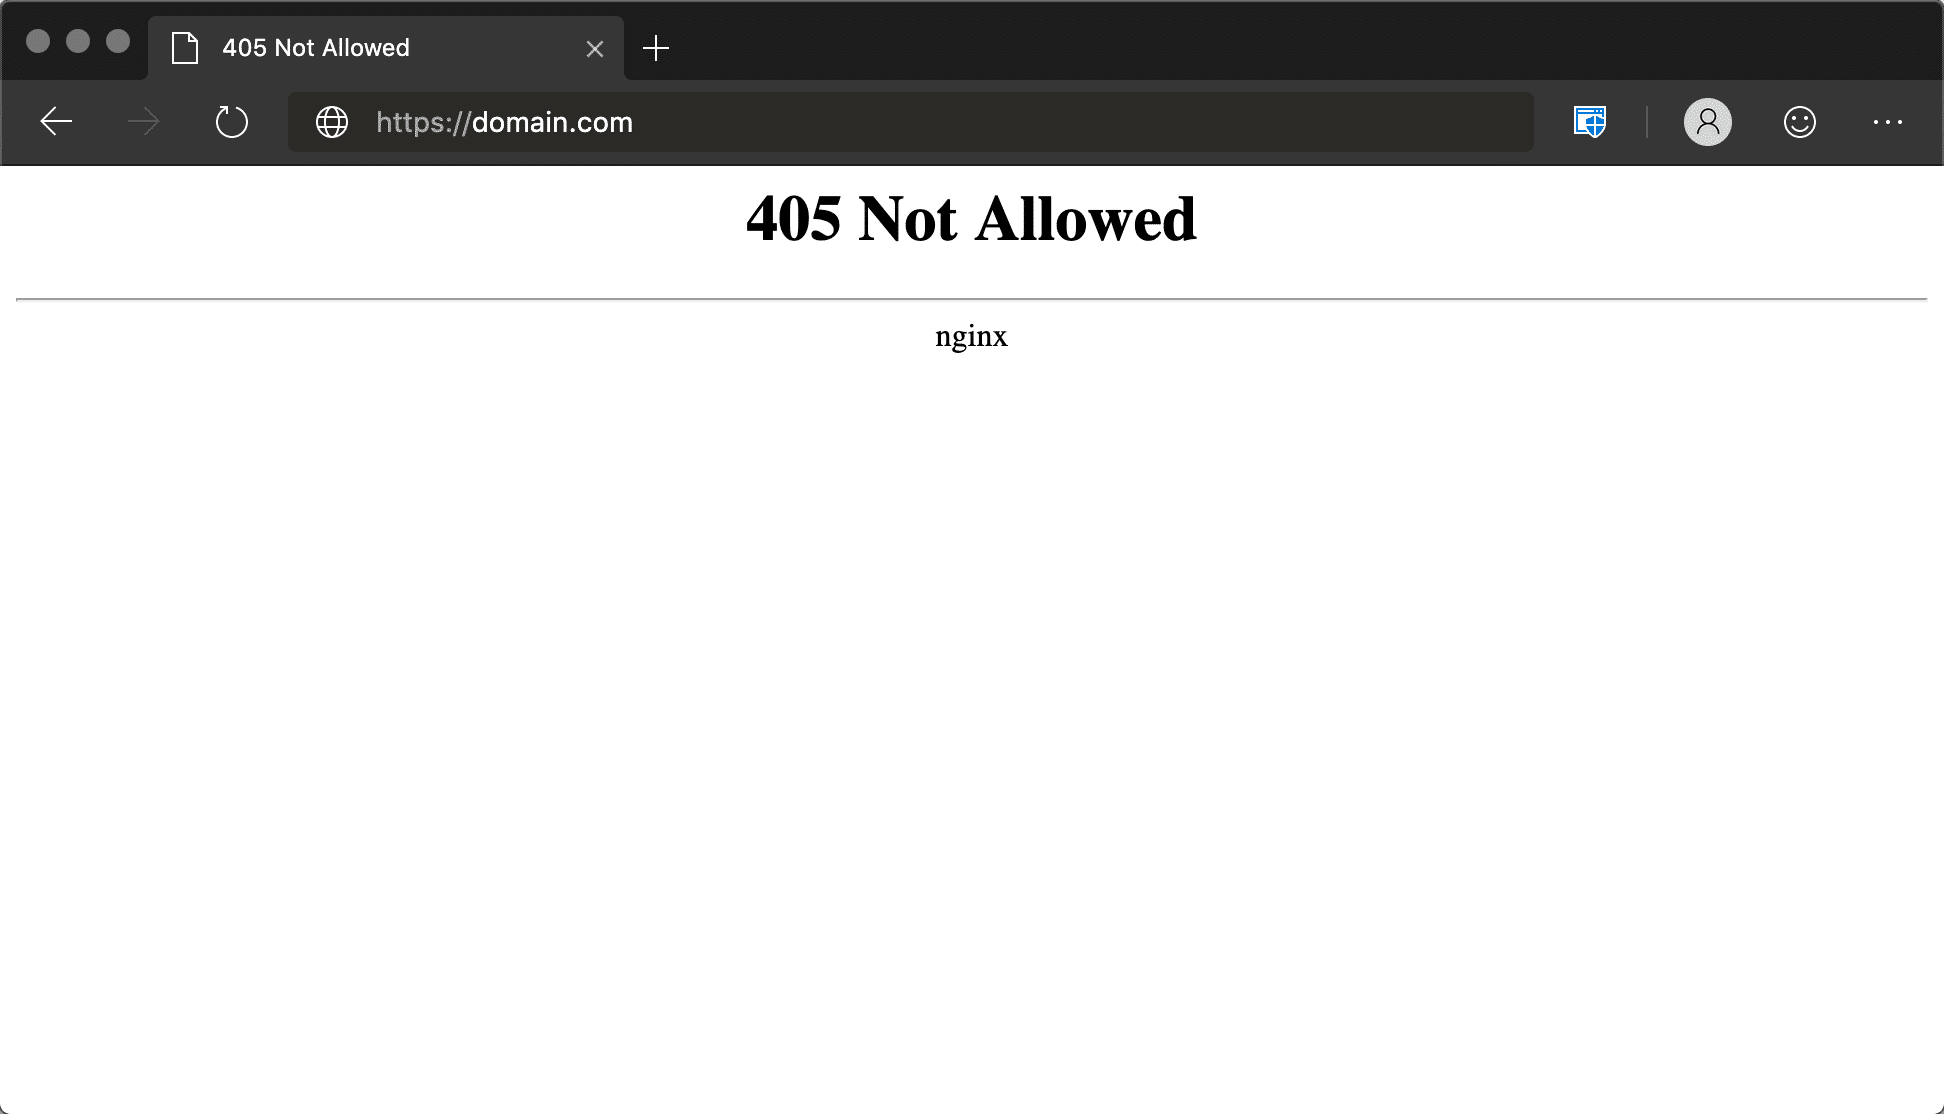 405 Not Allowed Error Nginx in Microsoft Edge